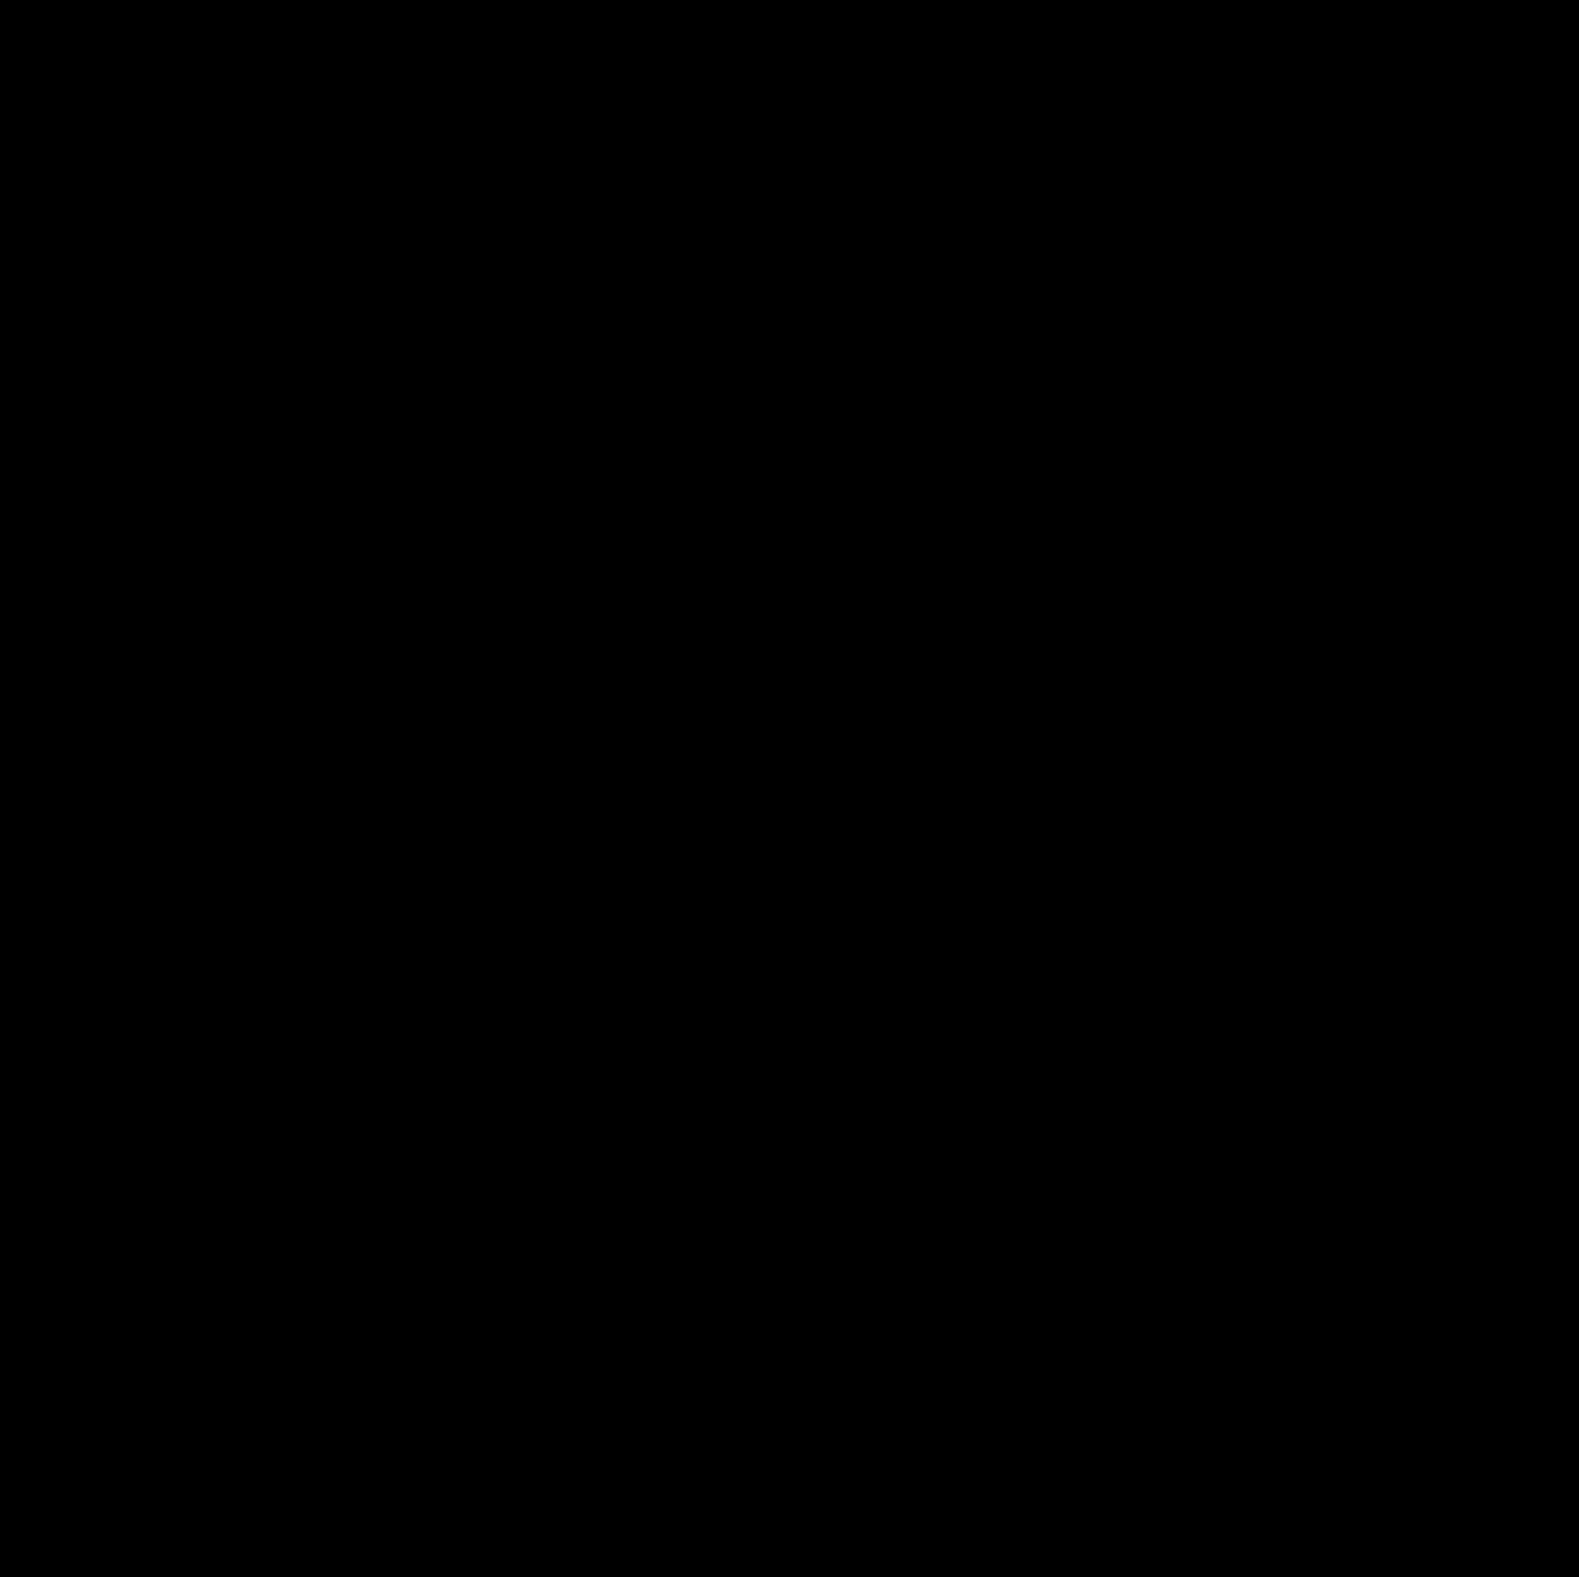 Gas Pump Image.